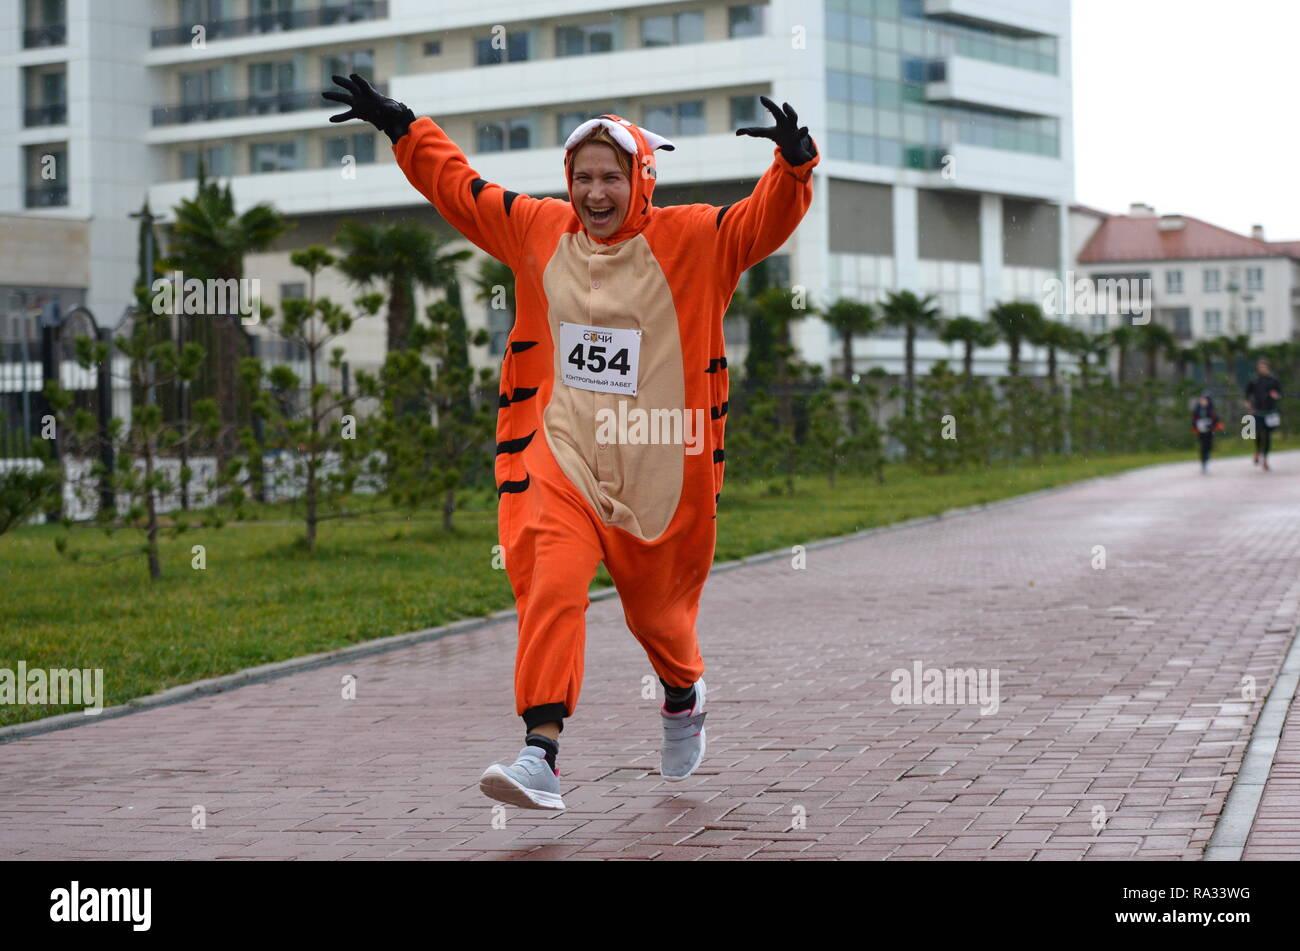 Sochi, Russia. 31st Dec, 2018. SOCHI, RUSSIA - DECEMBER 31, 2018: A woman takes part in a mass run in Imeretinskaya Embankment on New Year's Eve. Artur Lebedev/TASS Credit: ITAR-TASS News Agency/Alamy Live News Stock Photo